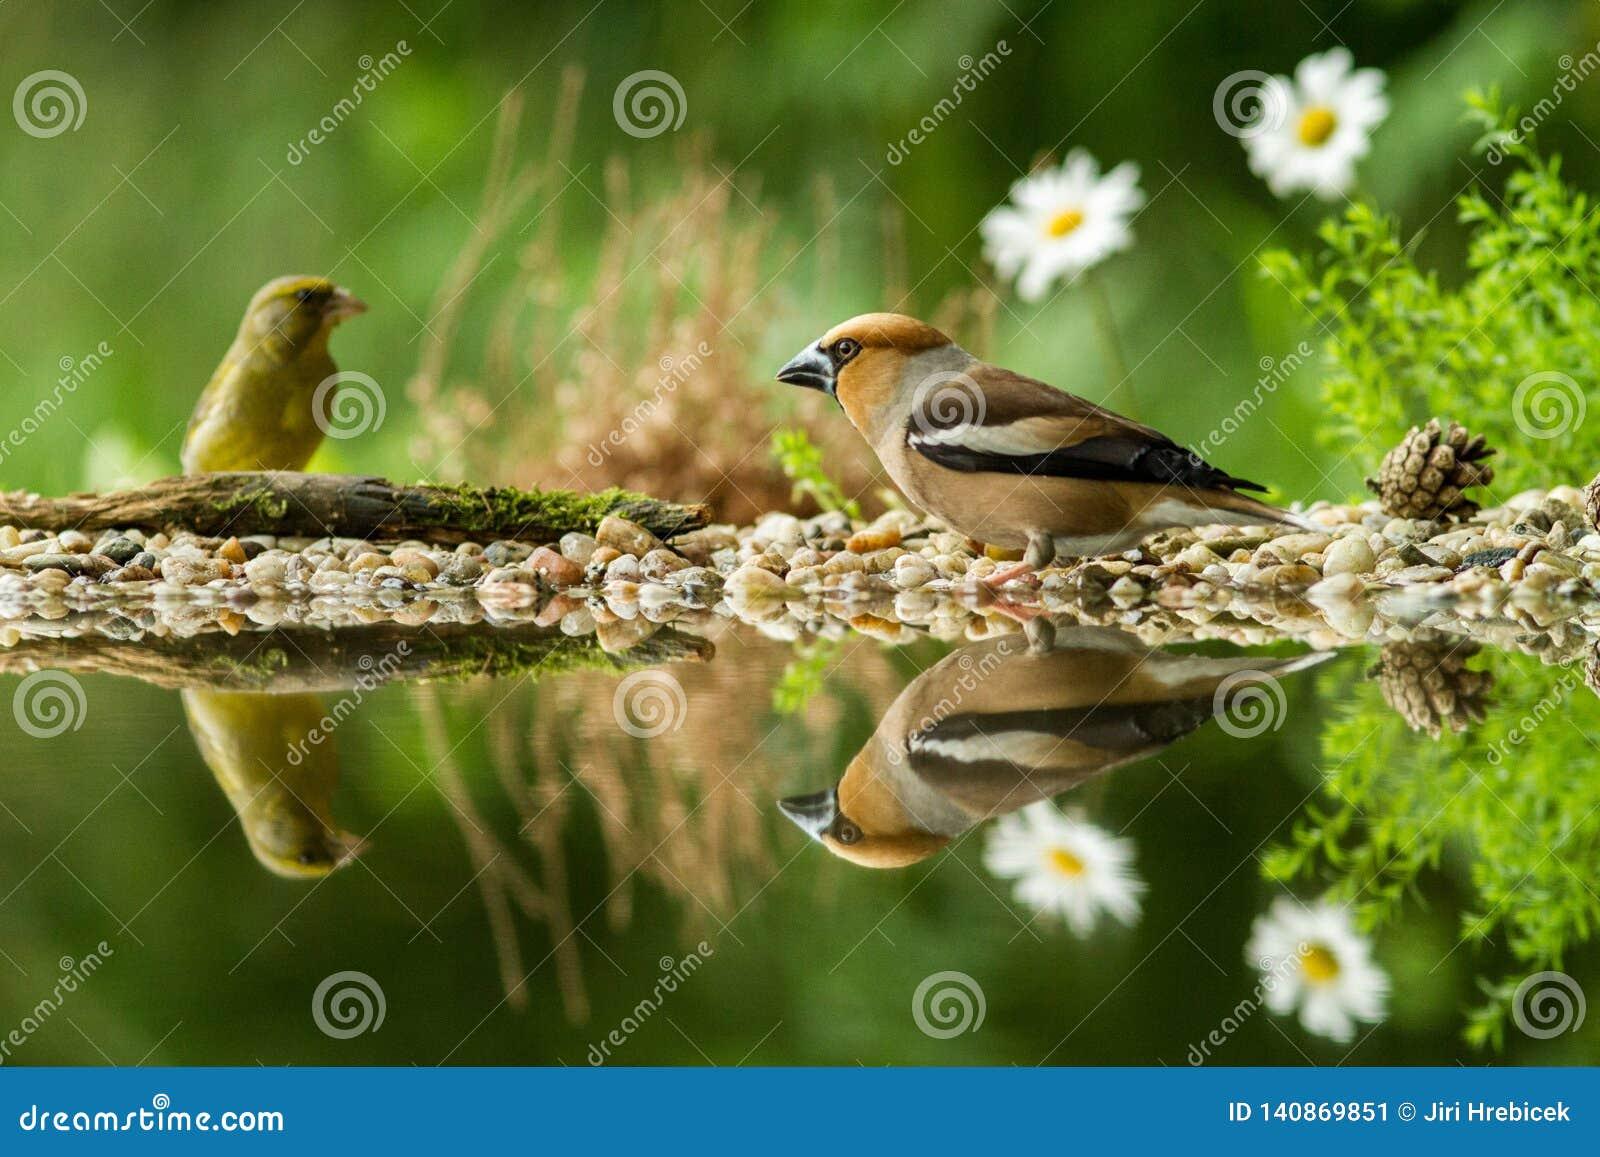 Hawfinch en groene vinkzitting op korstmoskust van watervijver in bos met mooie bokeh en bloemen op achtergrond, Duitsland